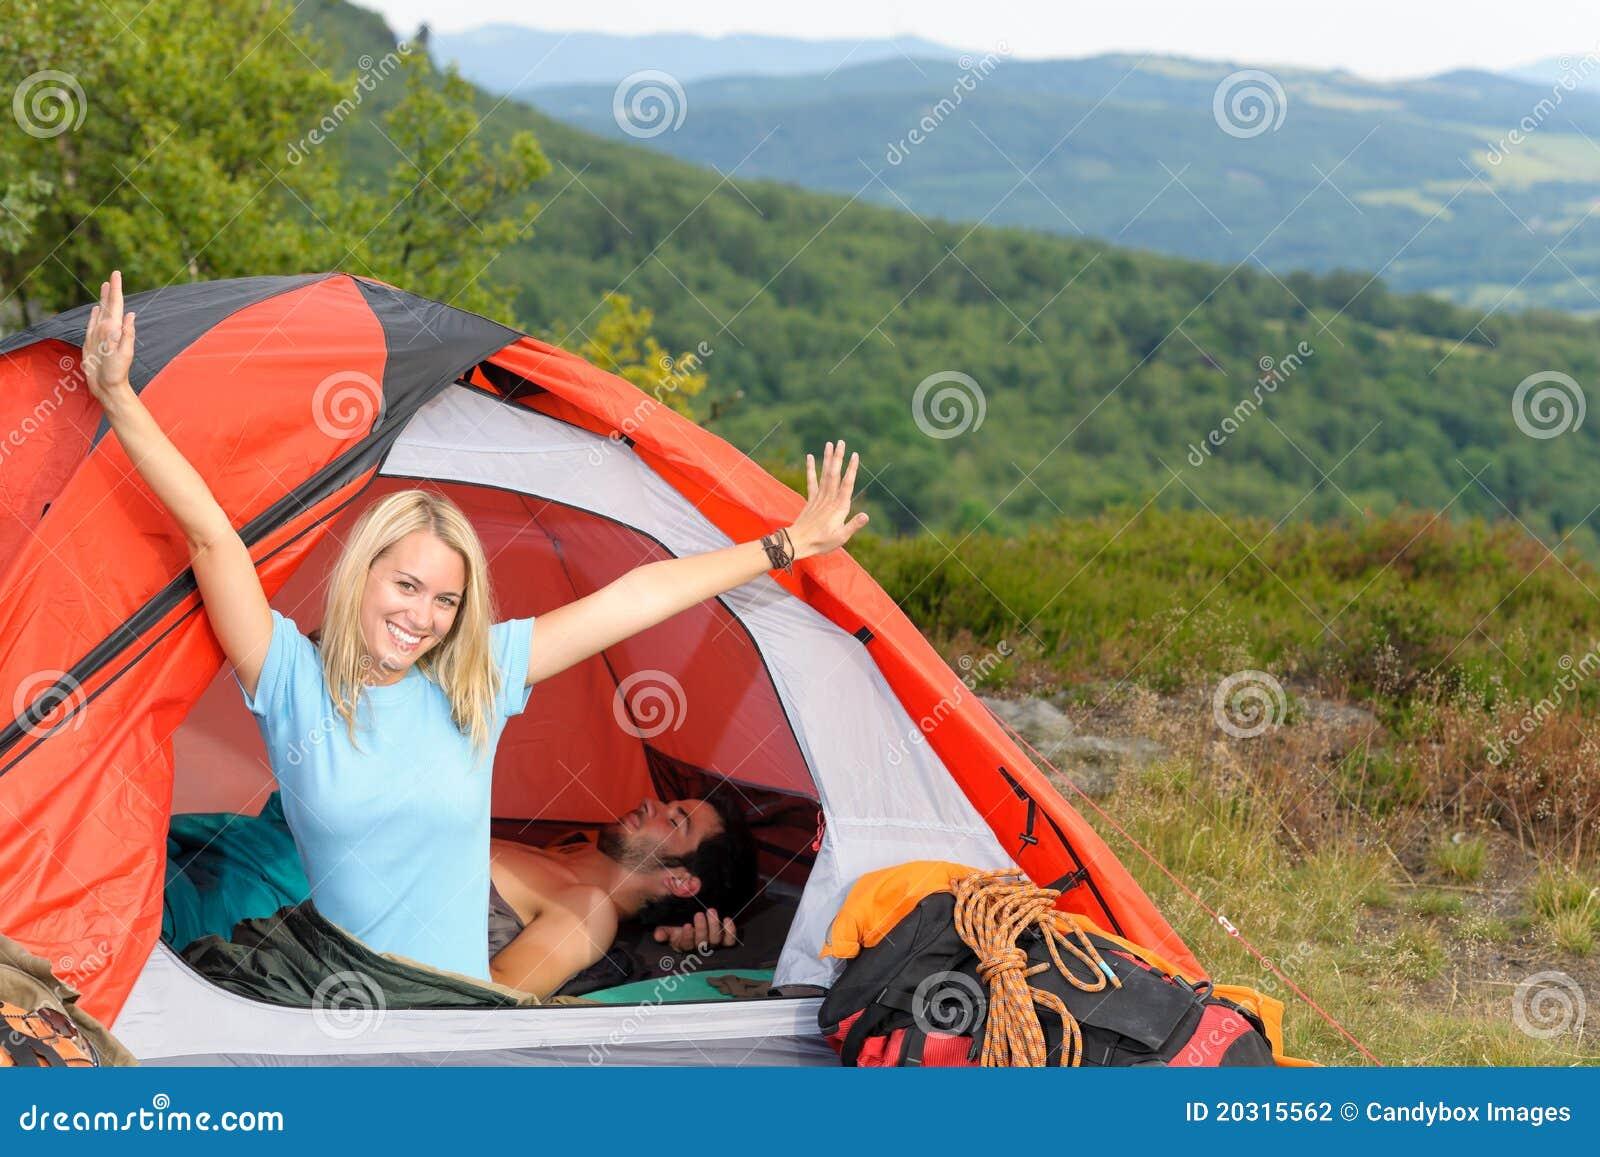 C&ing young couple sunset tent climbing gear  sc 1 st  Dreamstime.com & Camping Young Couple Sunset Tent Climbing Gear Stock Photo - Image ...